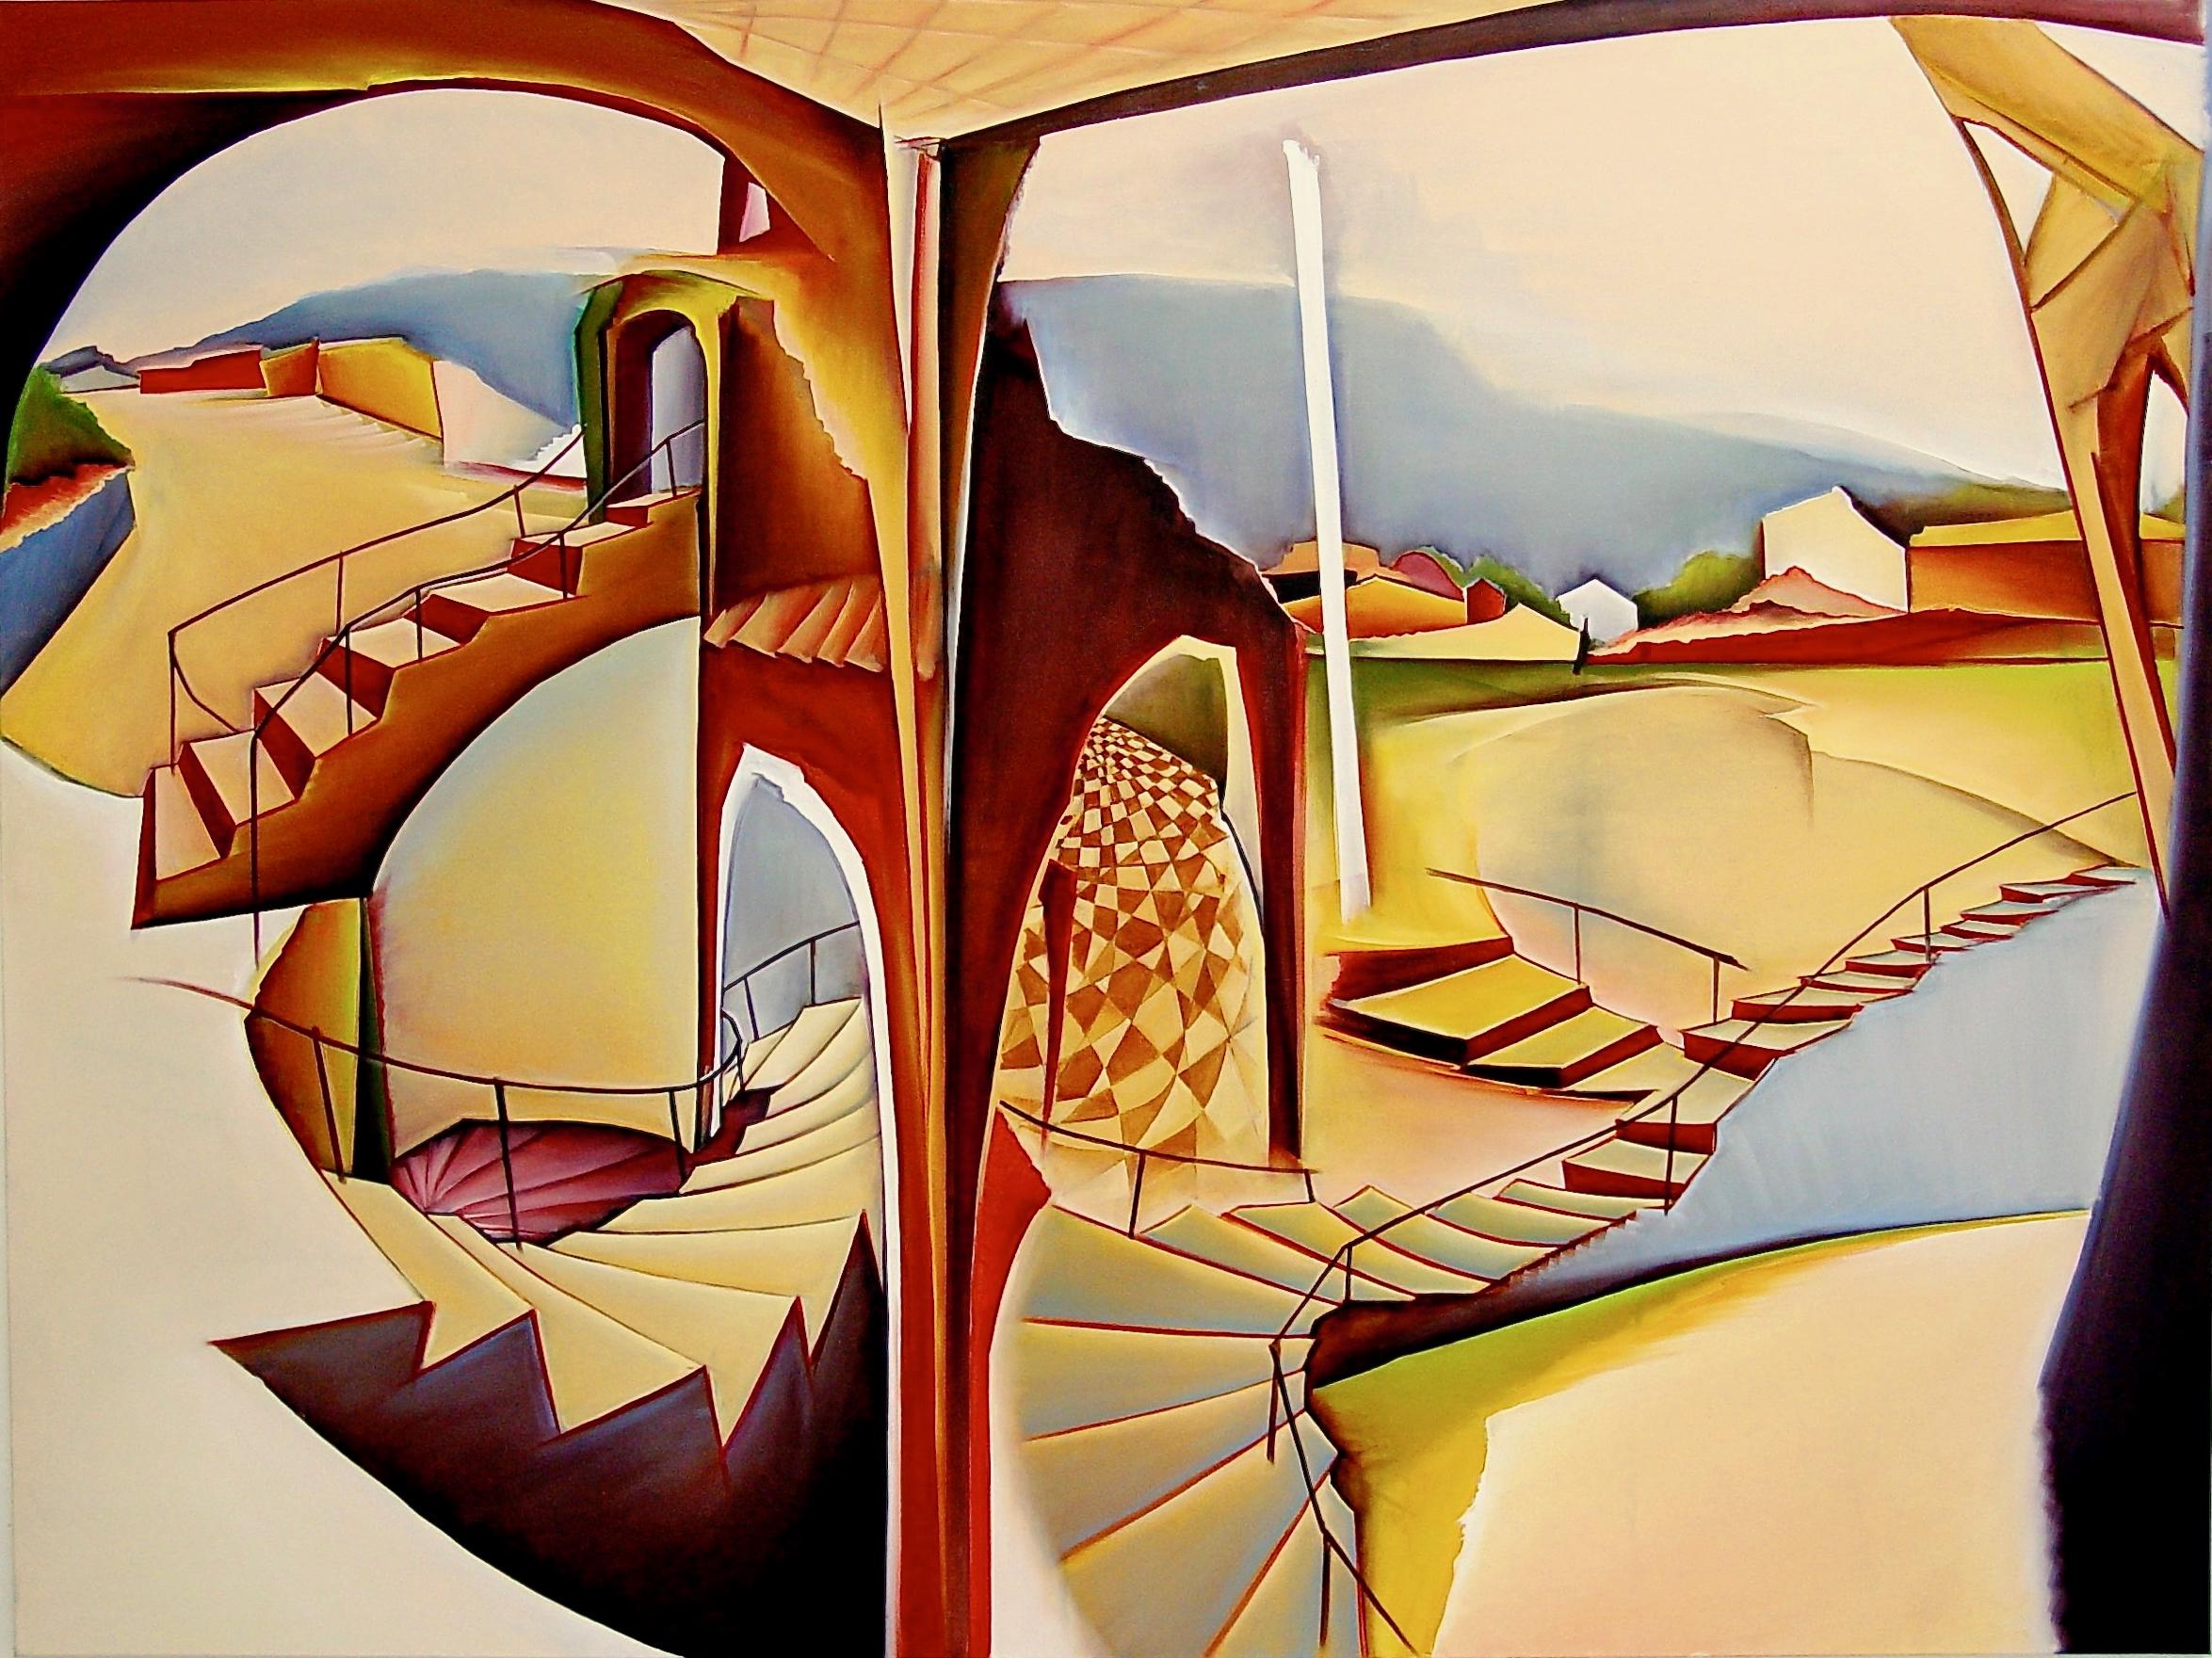 3. Utopia, Oil on canvas, 150 x 200 cm.jpg